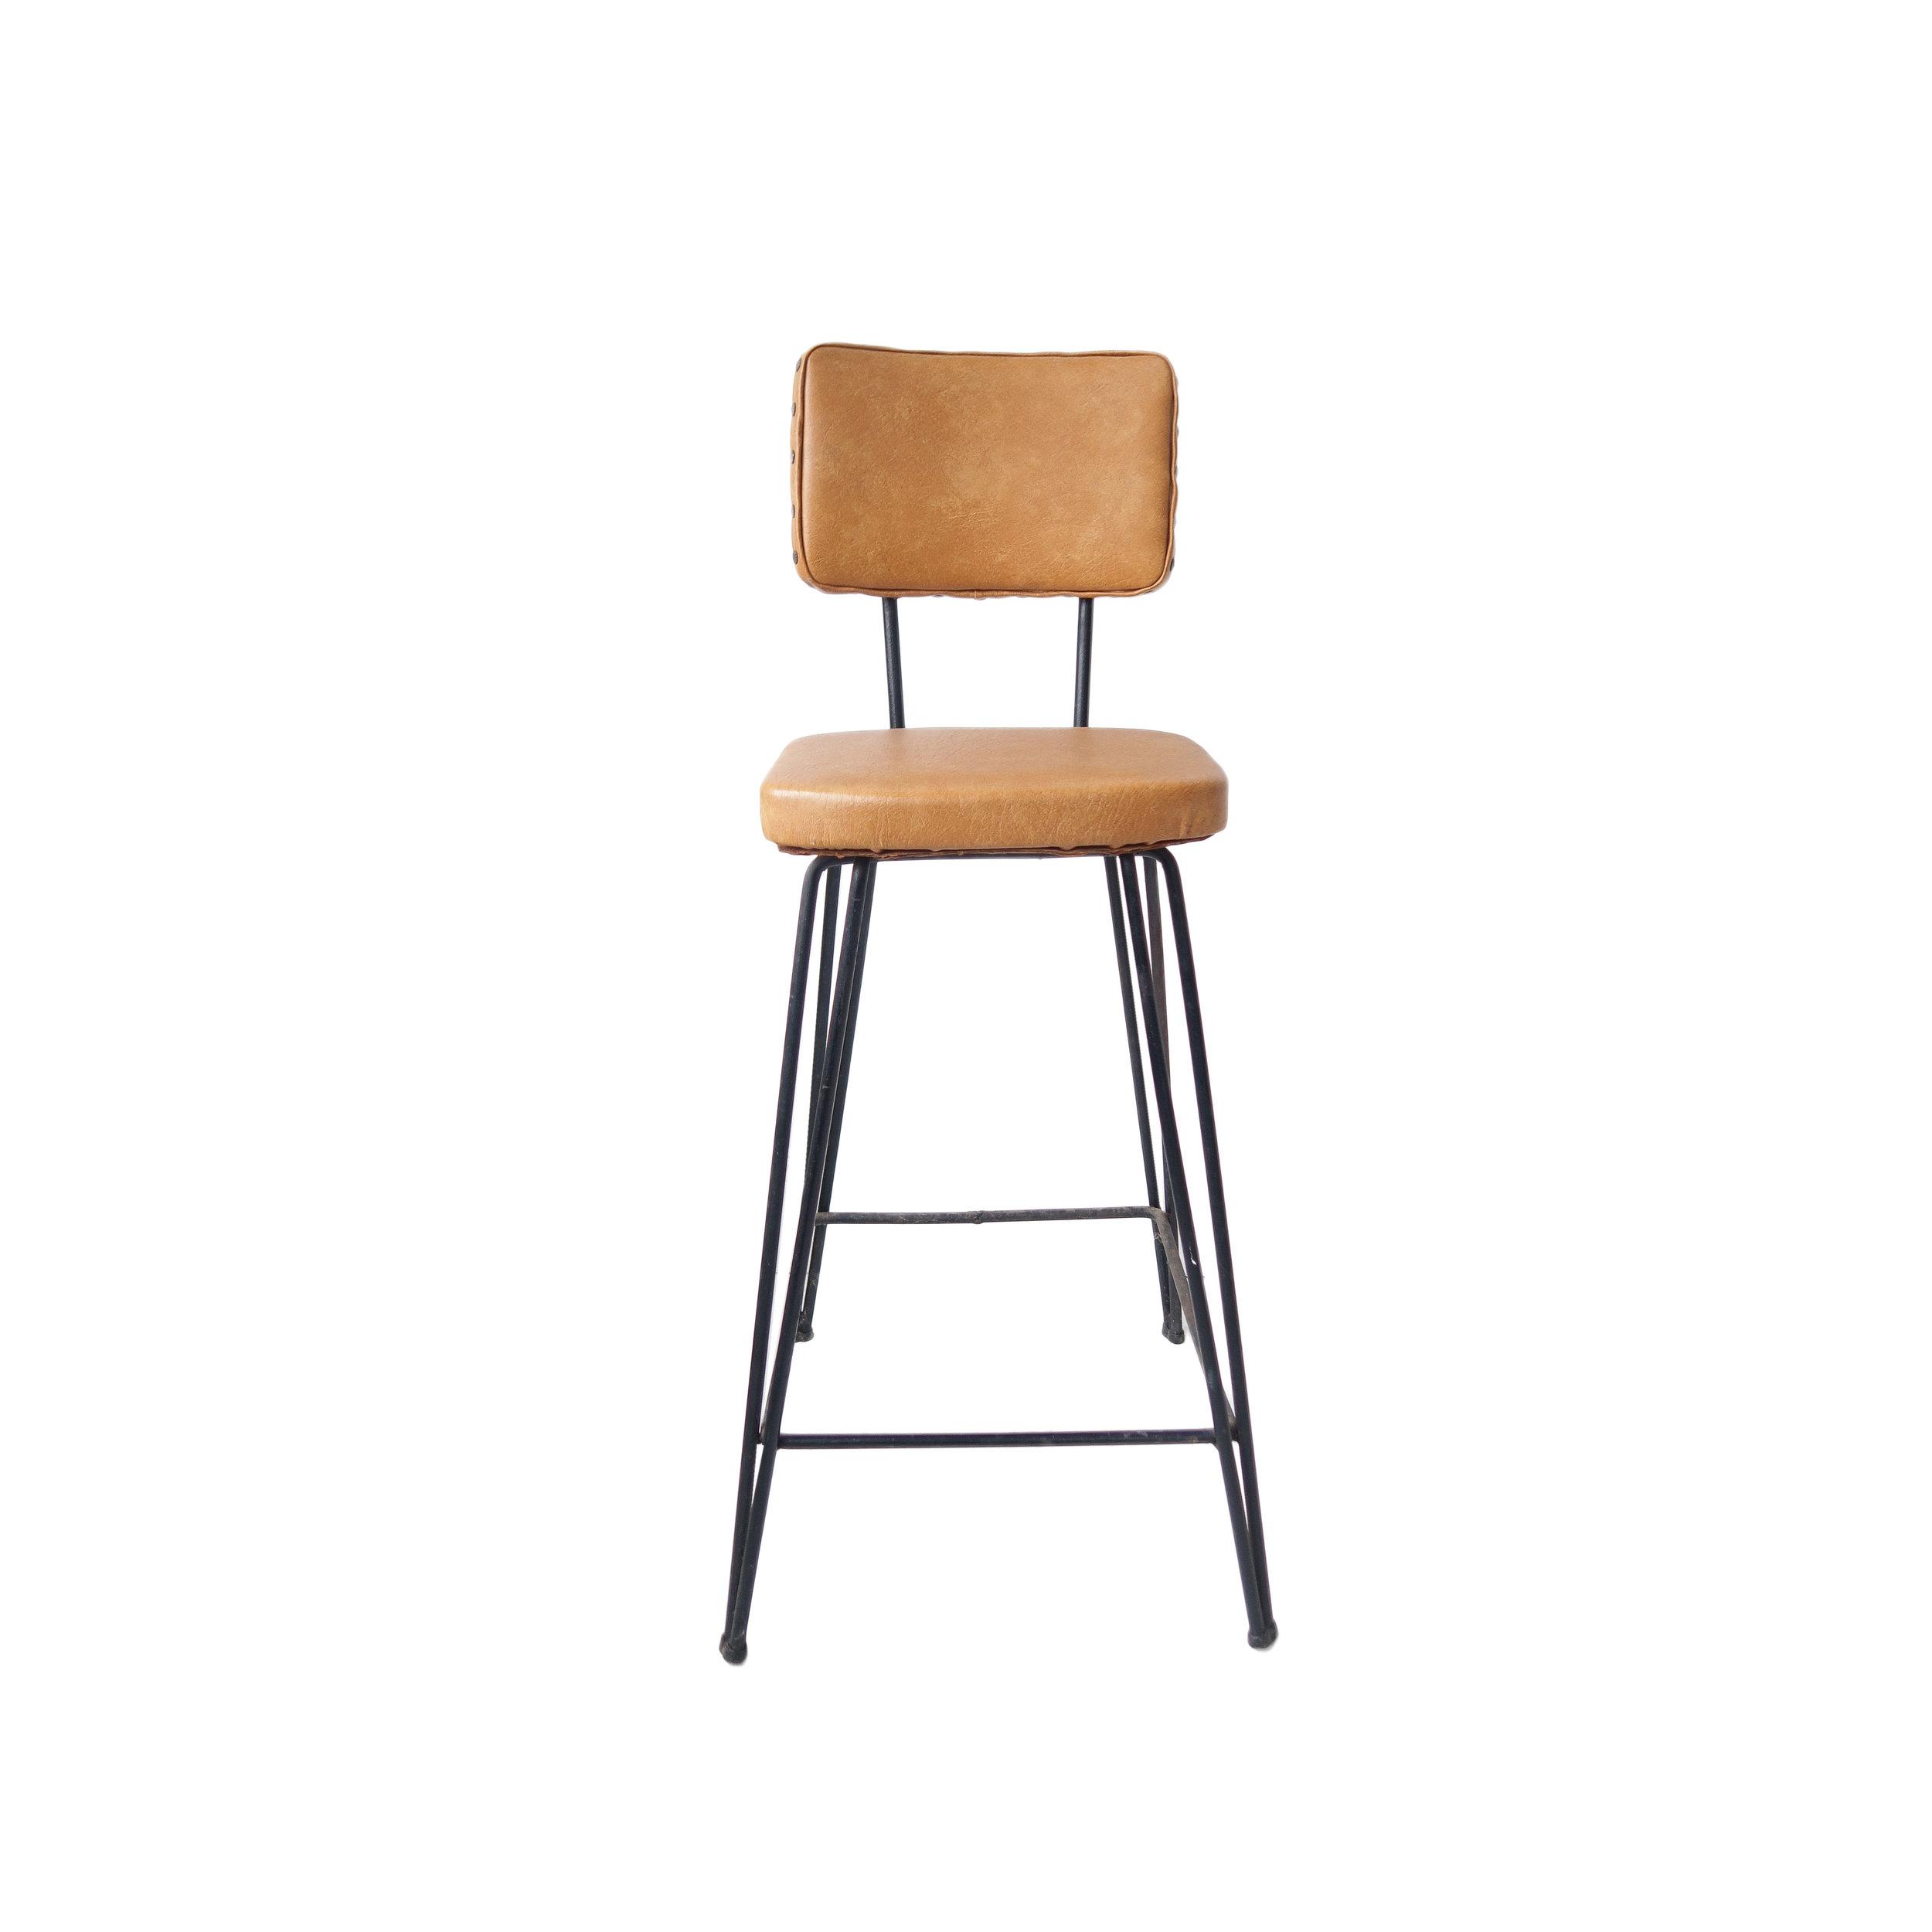 vintage mid century modern bar stool.jpg